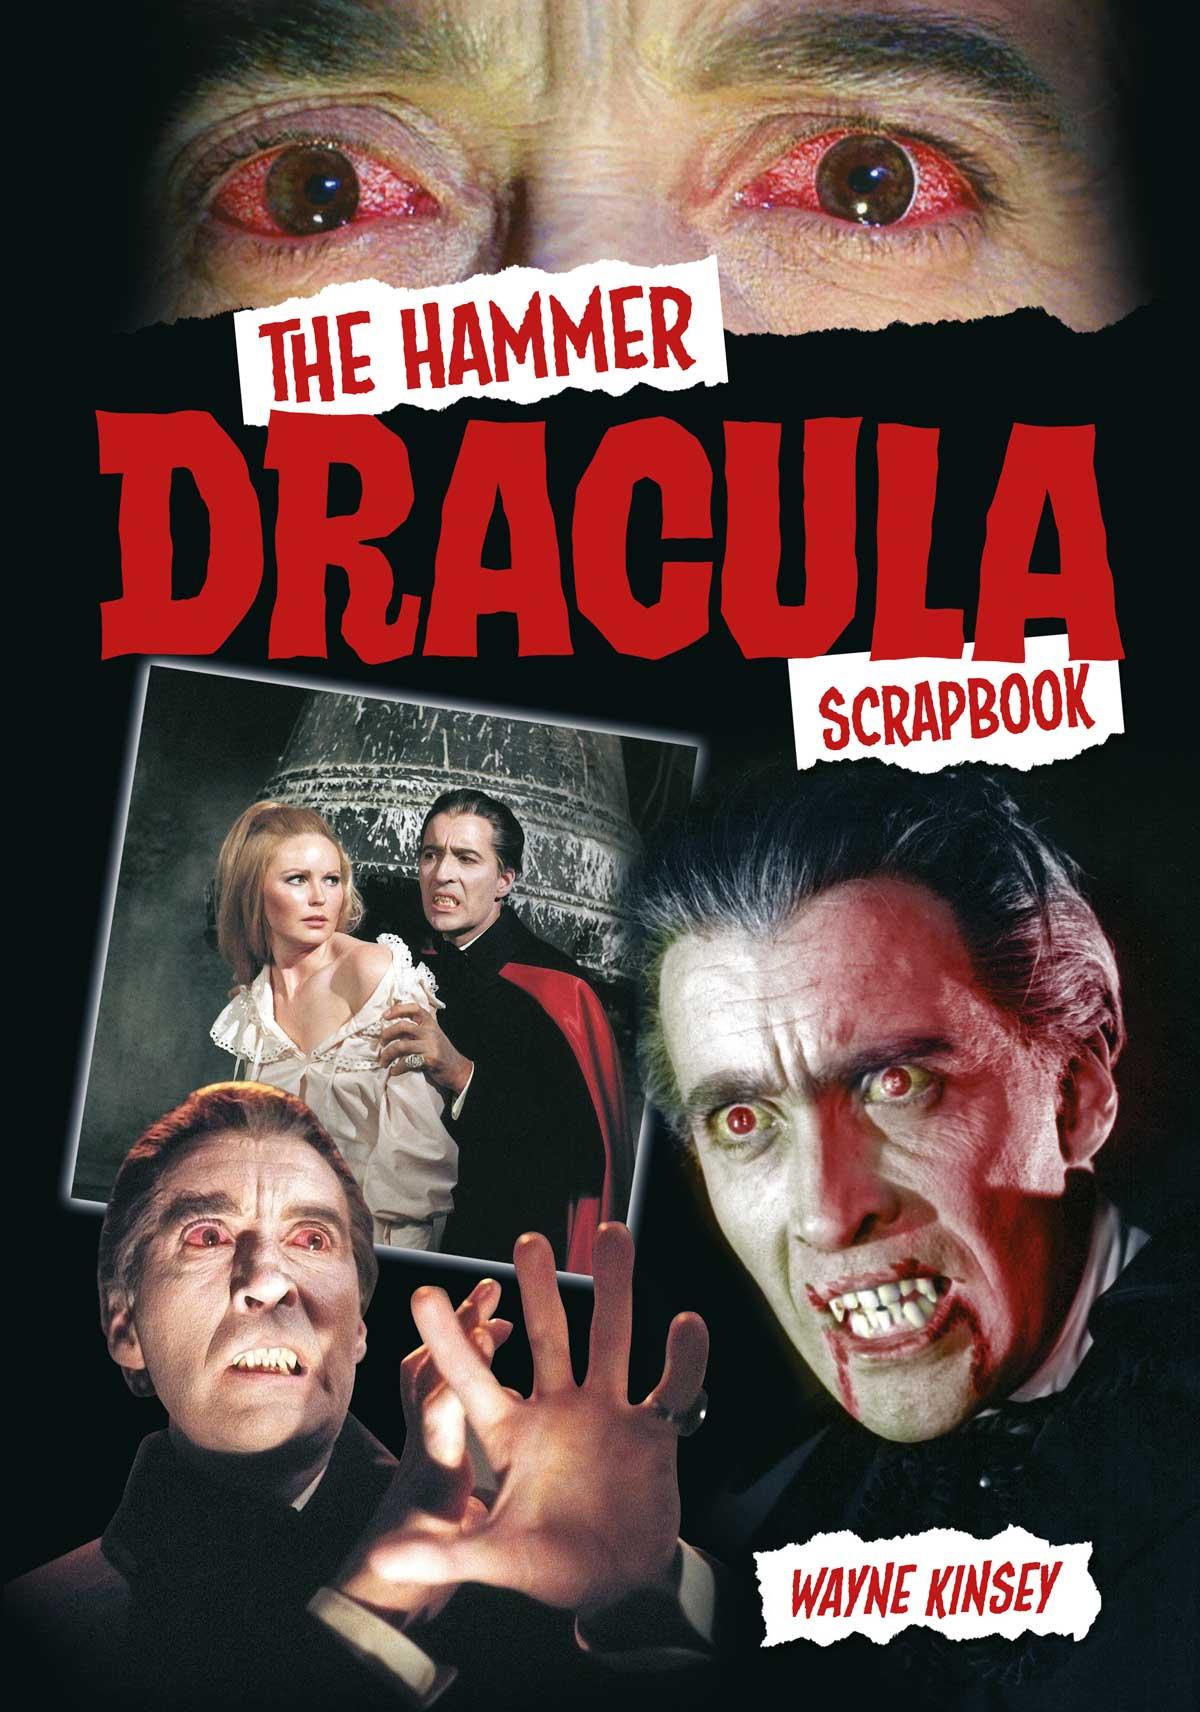 Hammer Dracula Scrapbook